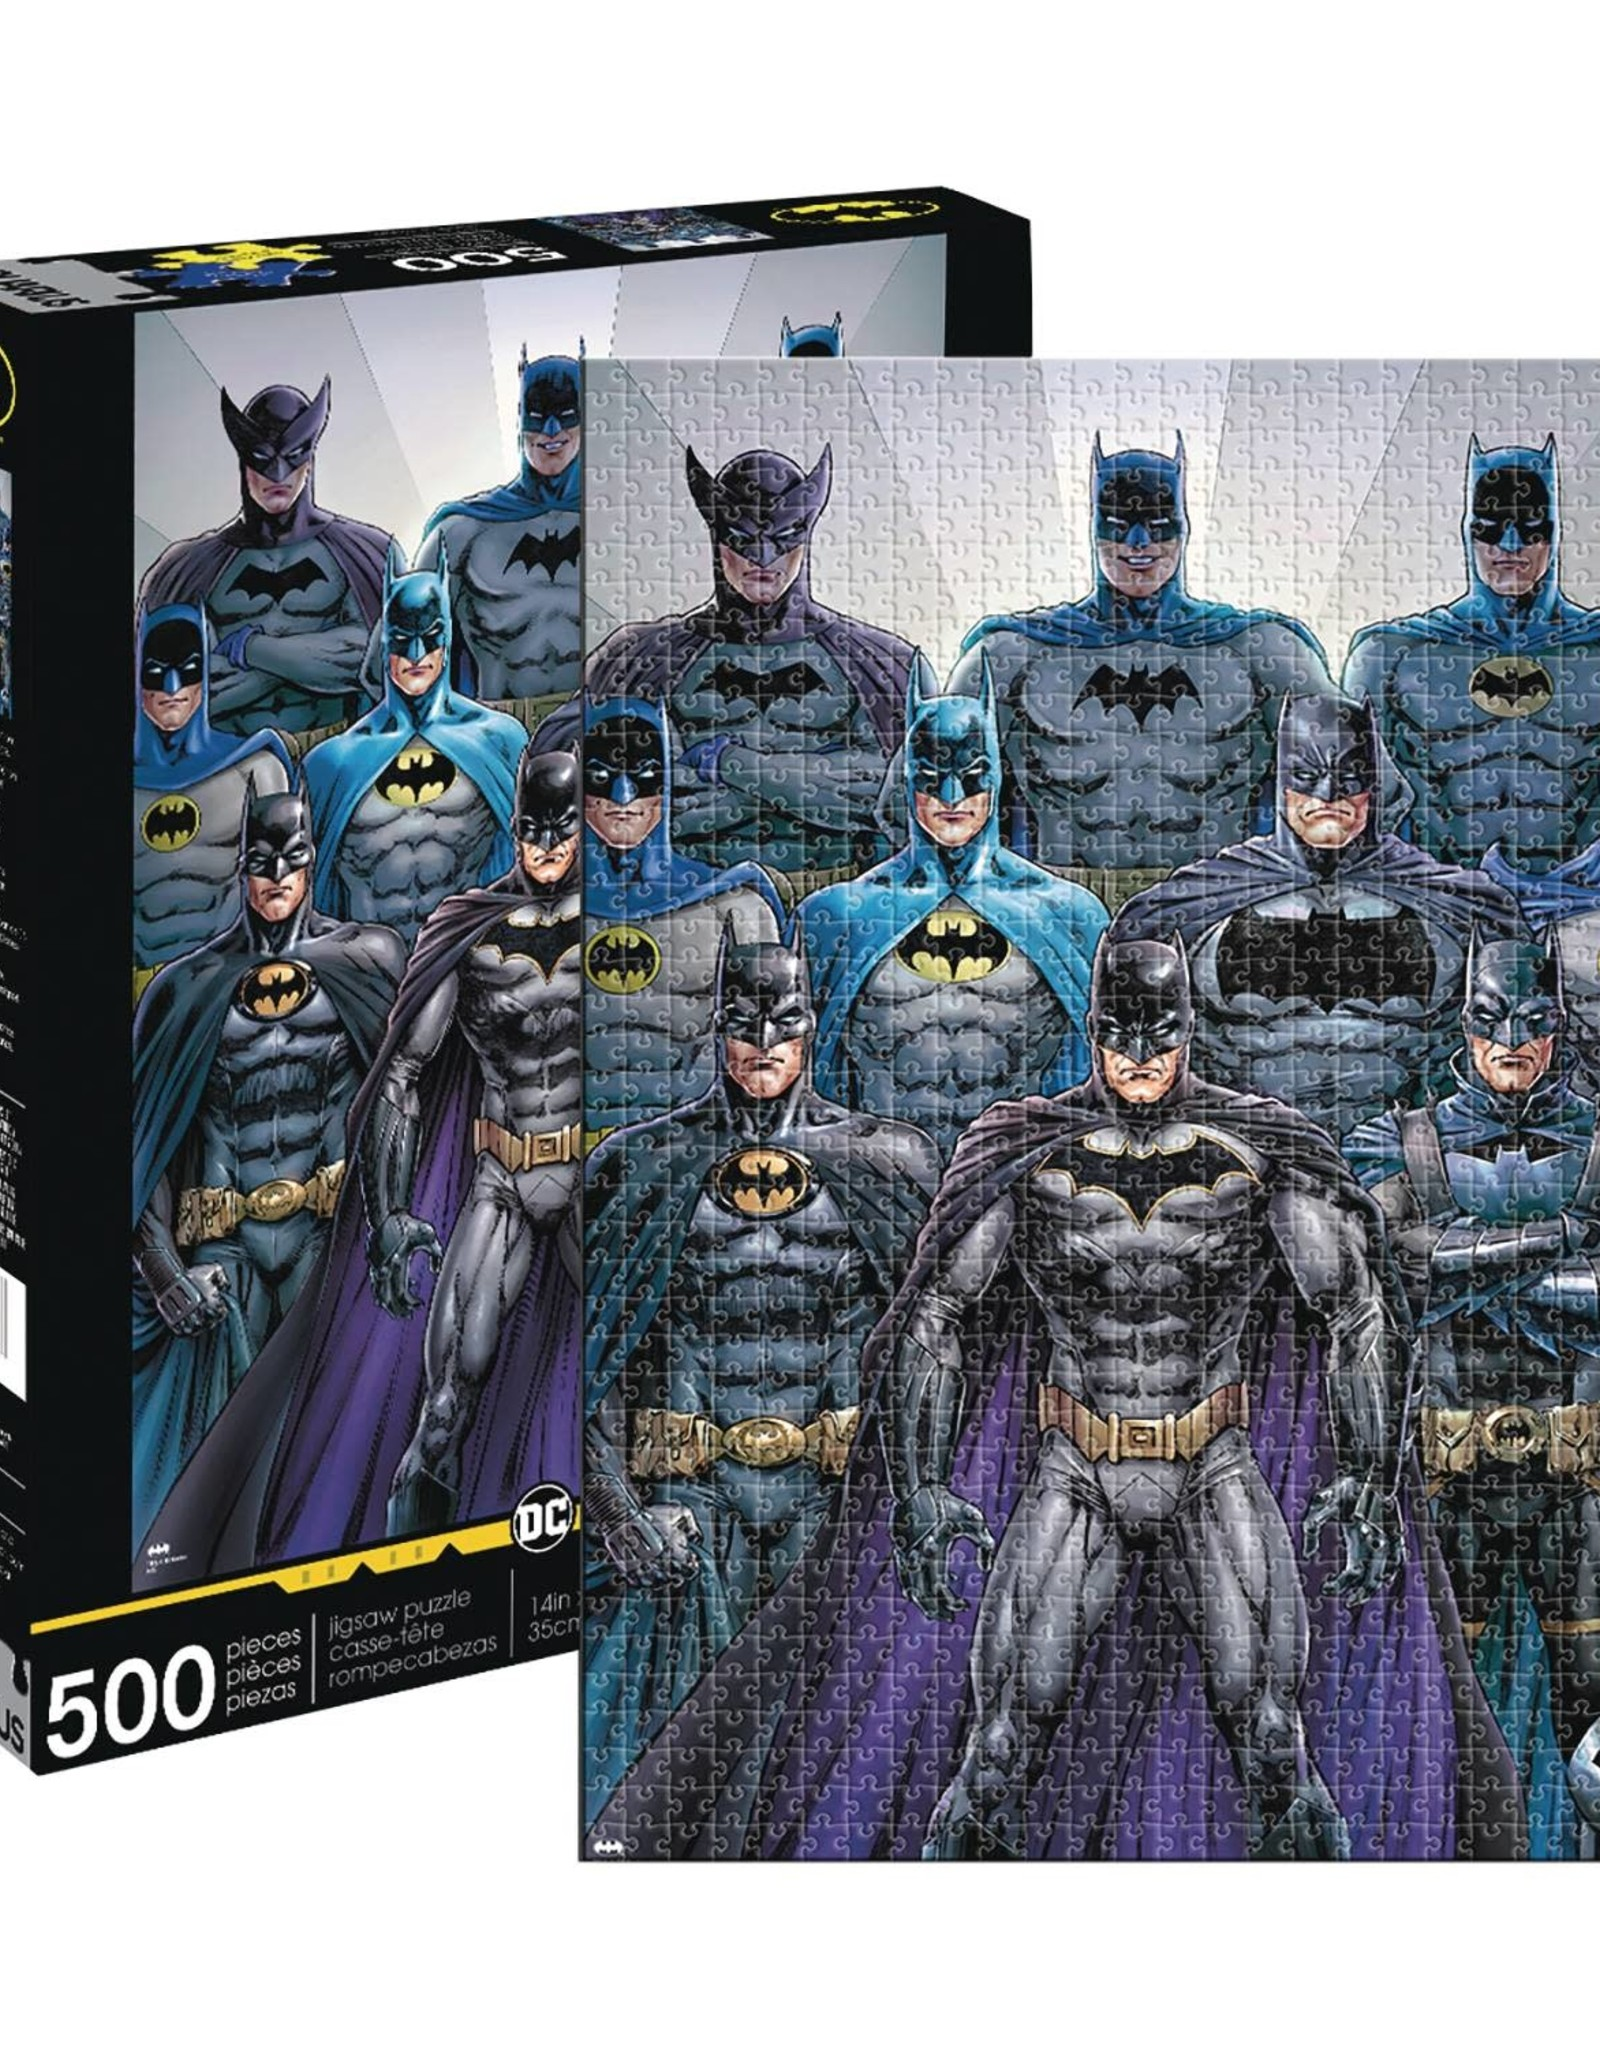 NMR Aquarius Batman Batsuits 500pc Puzzle